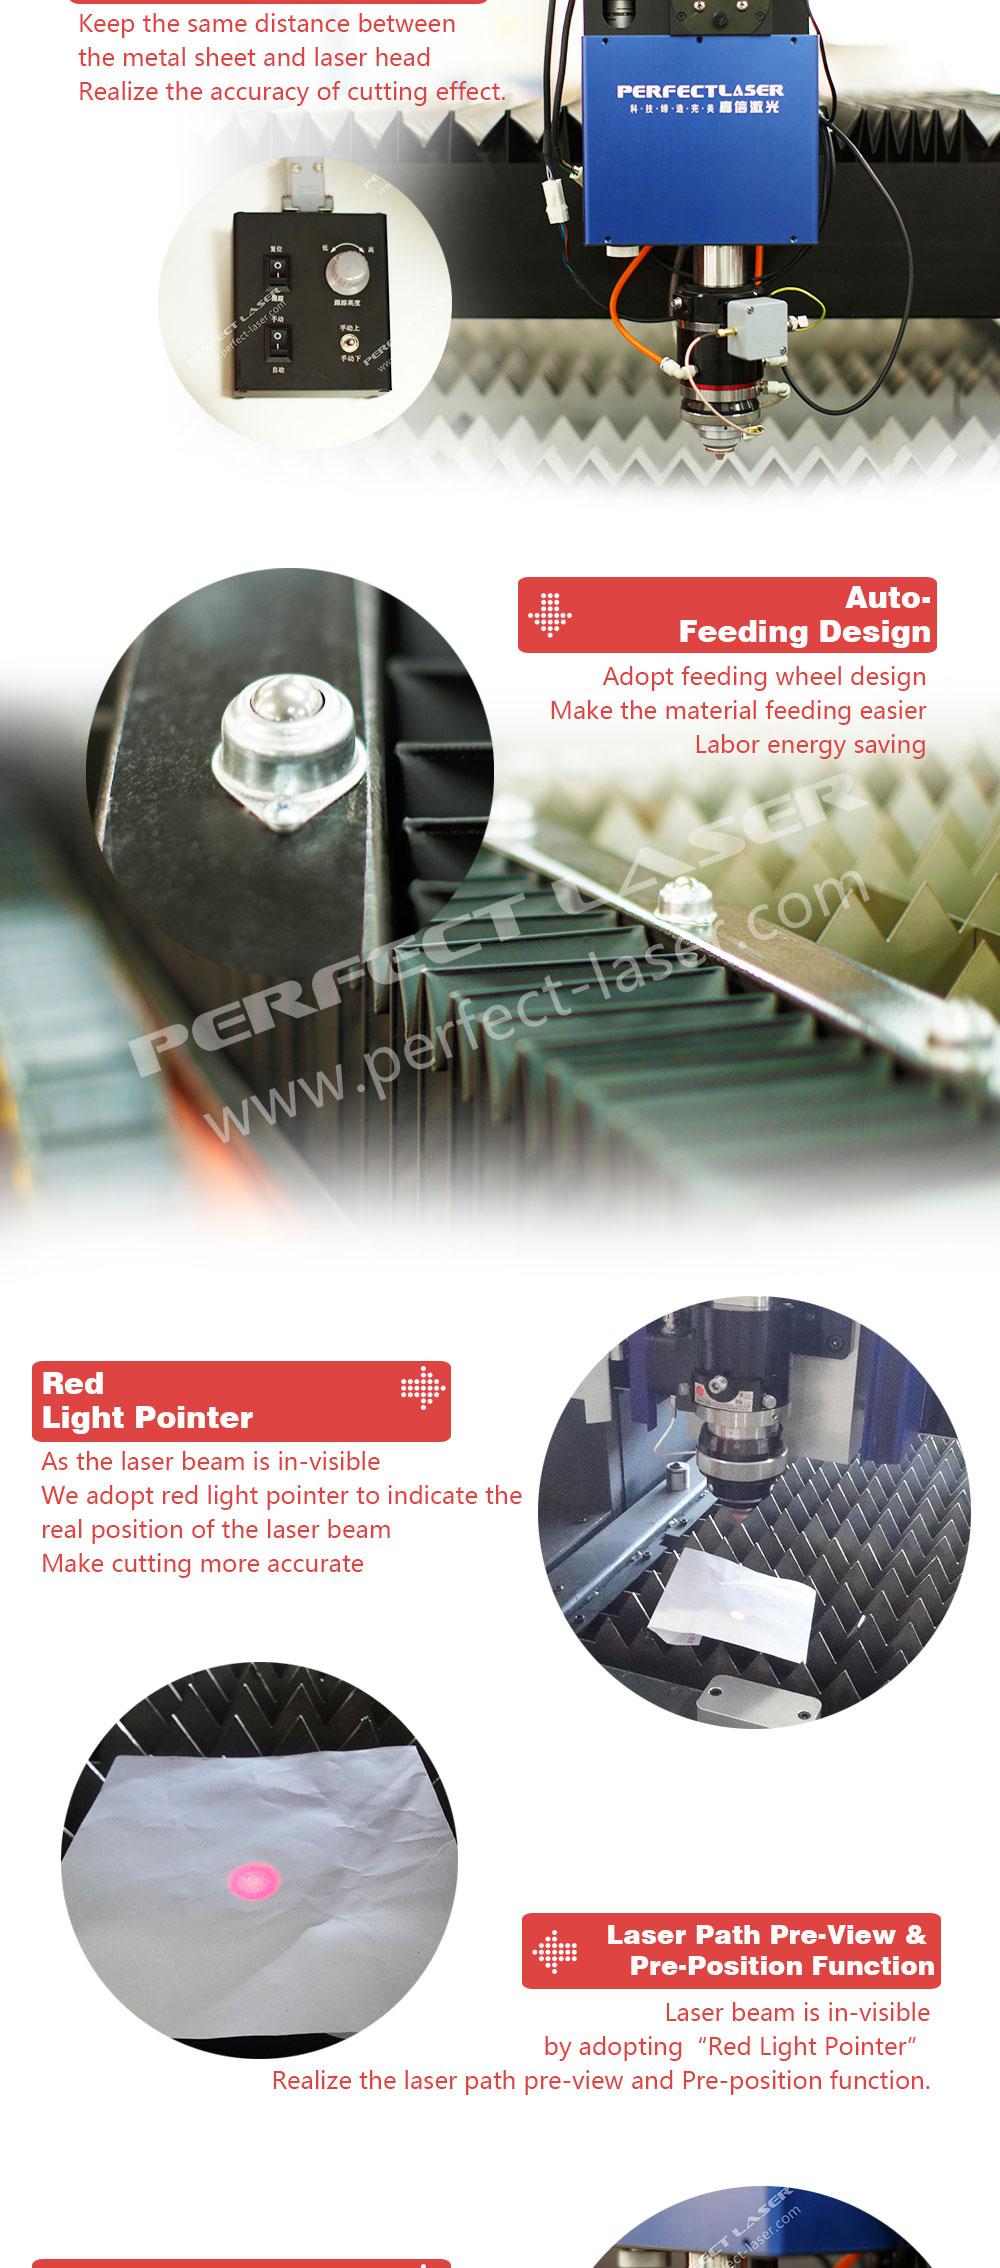 05 Perfect Laser-Fiber Laser Cutting Machine.jpg